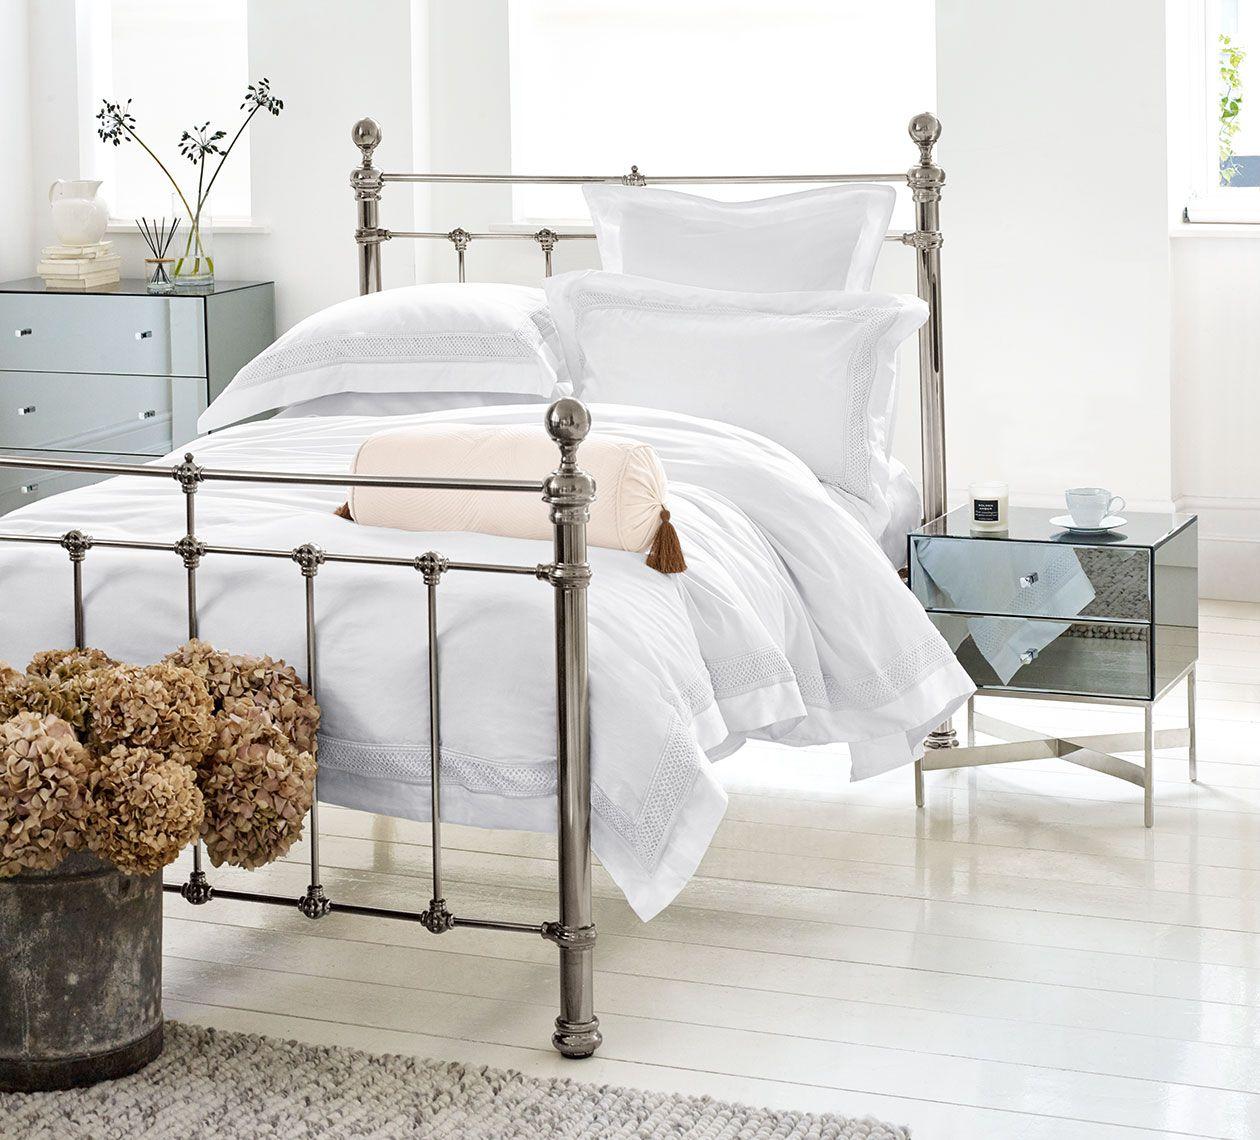 10 ways to transform your bedroom